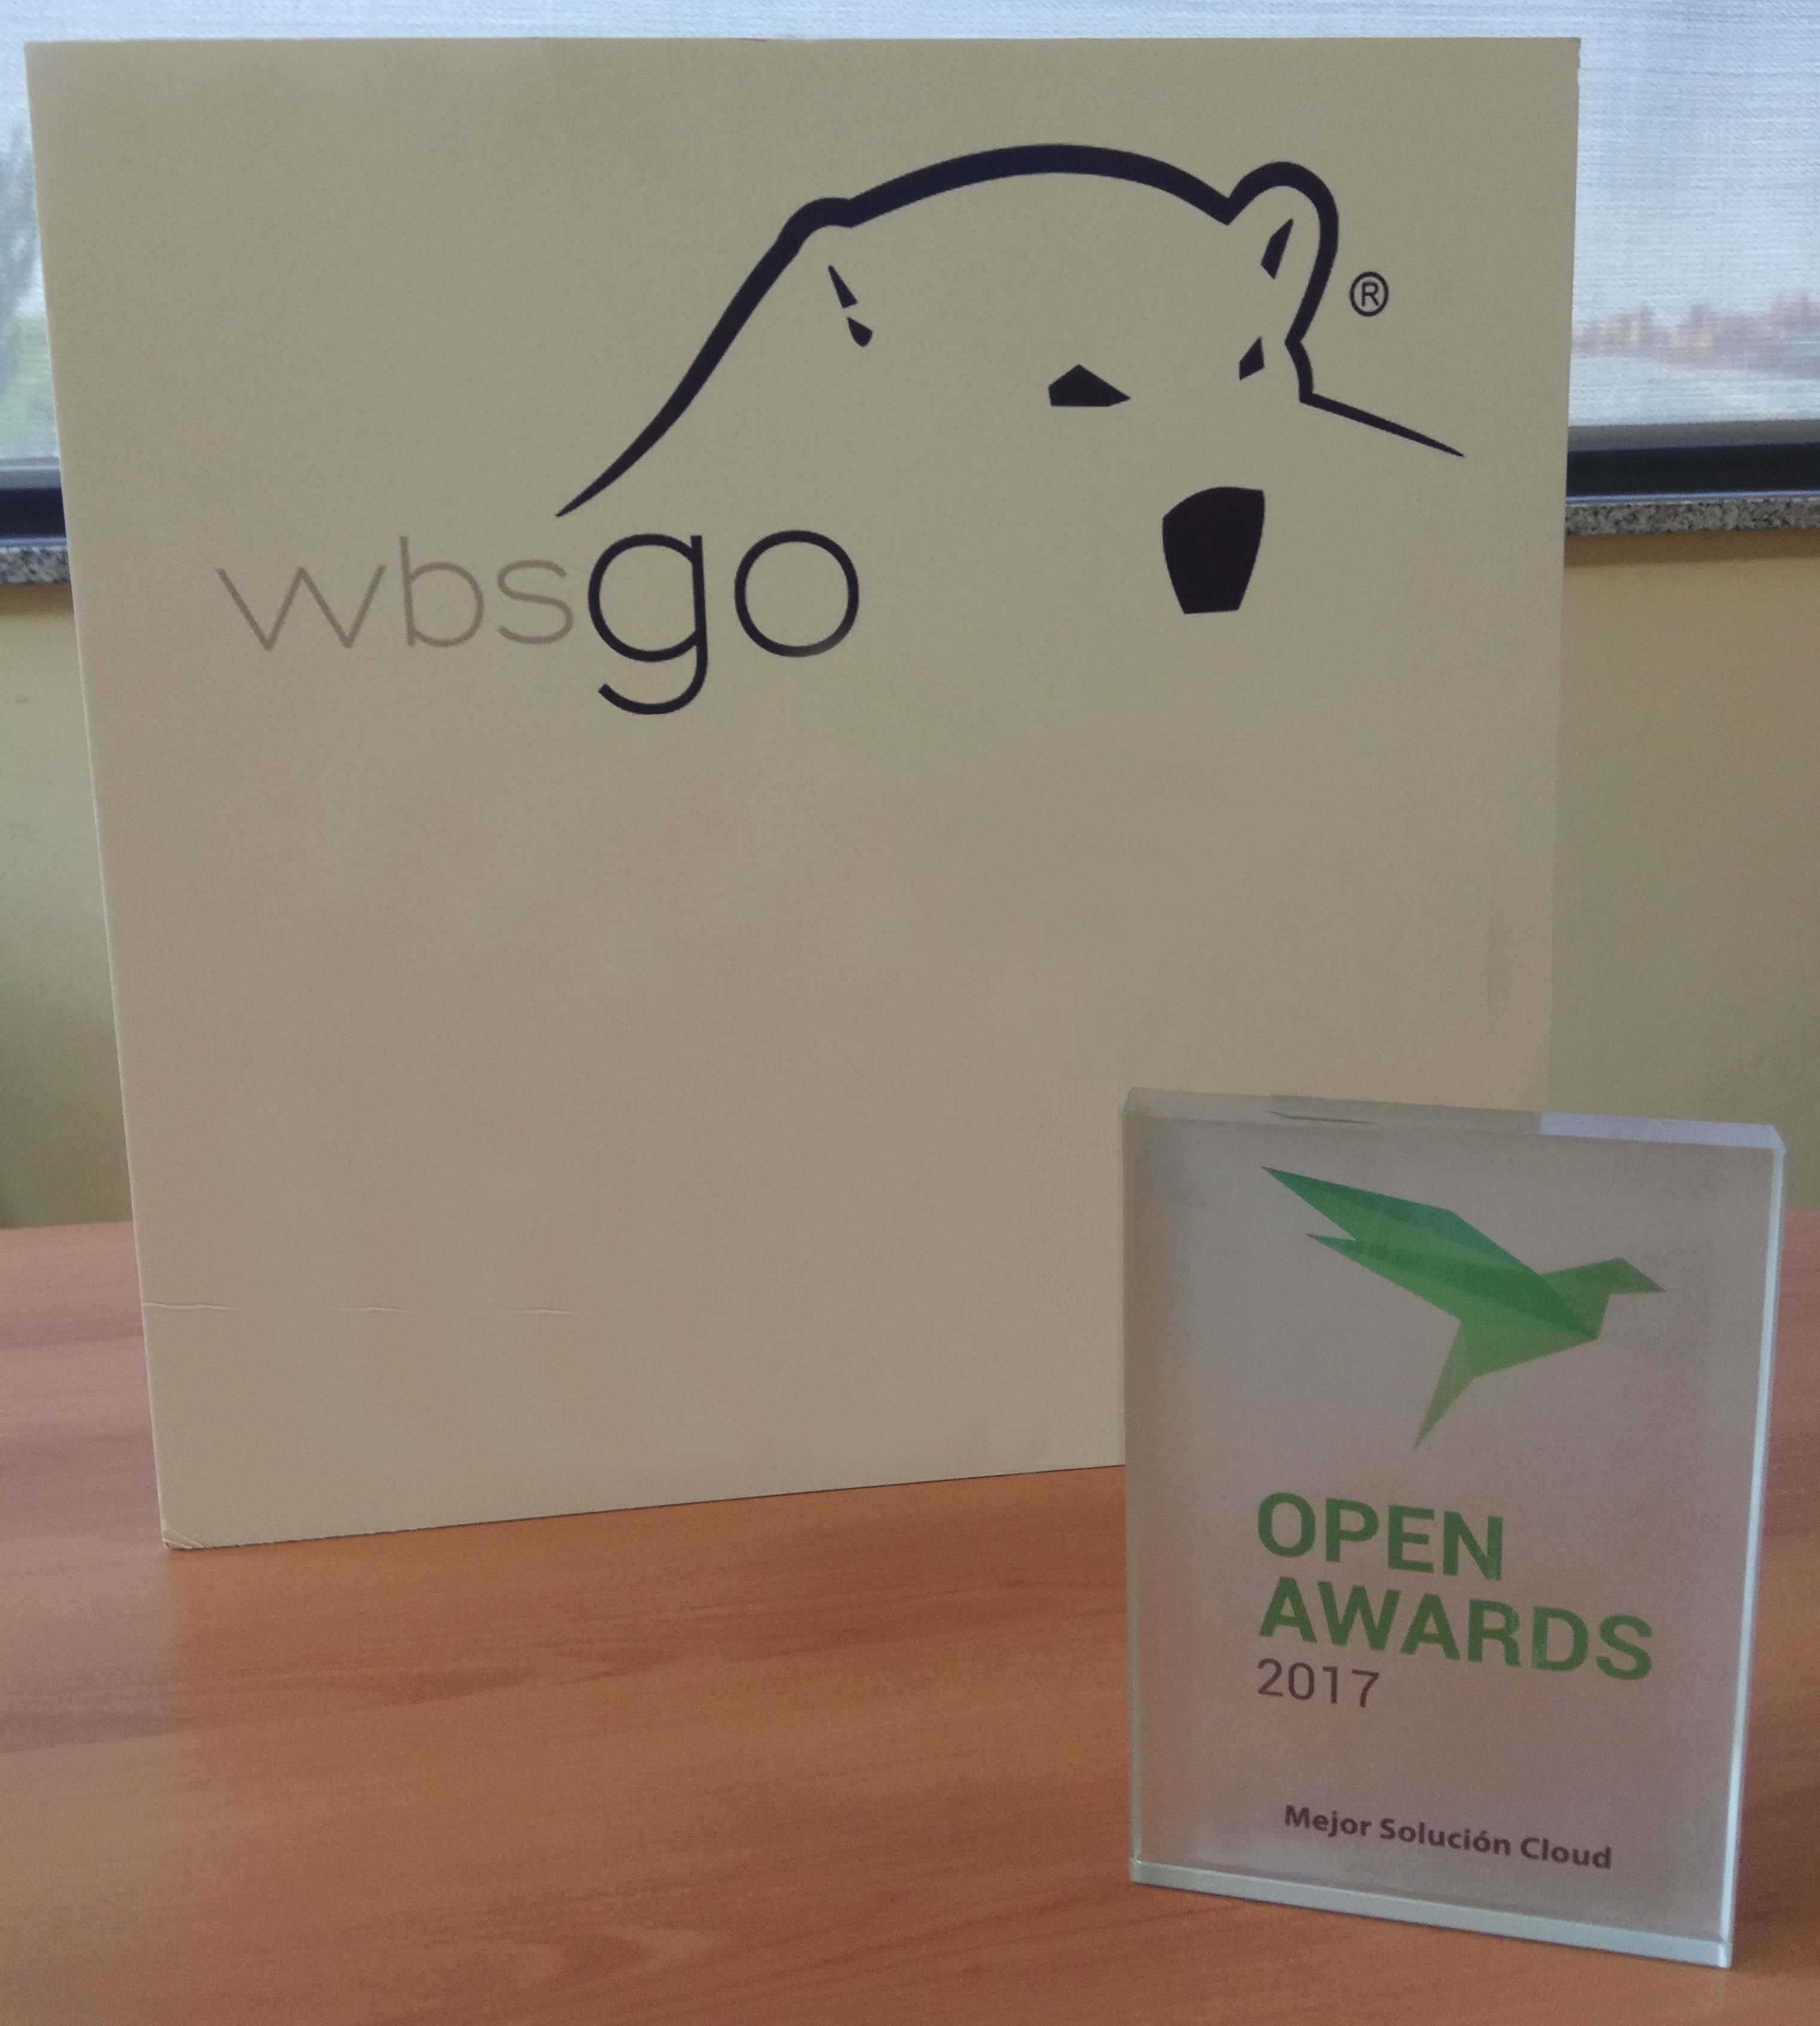 Open Awards 2017